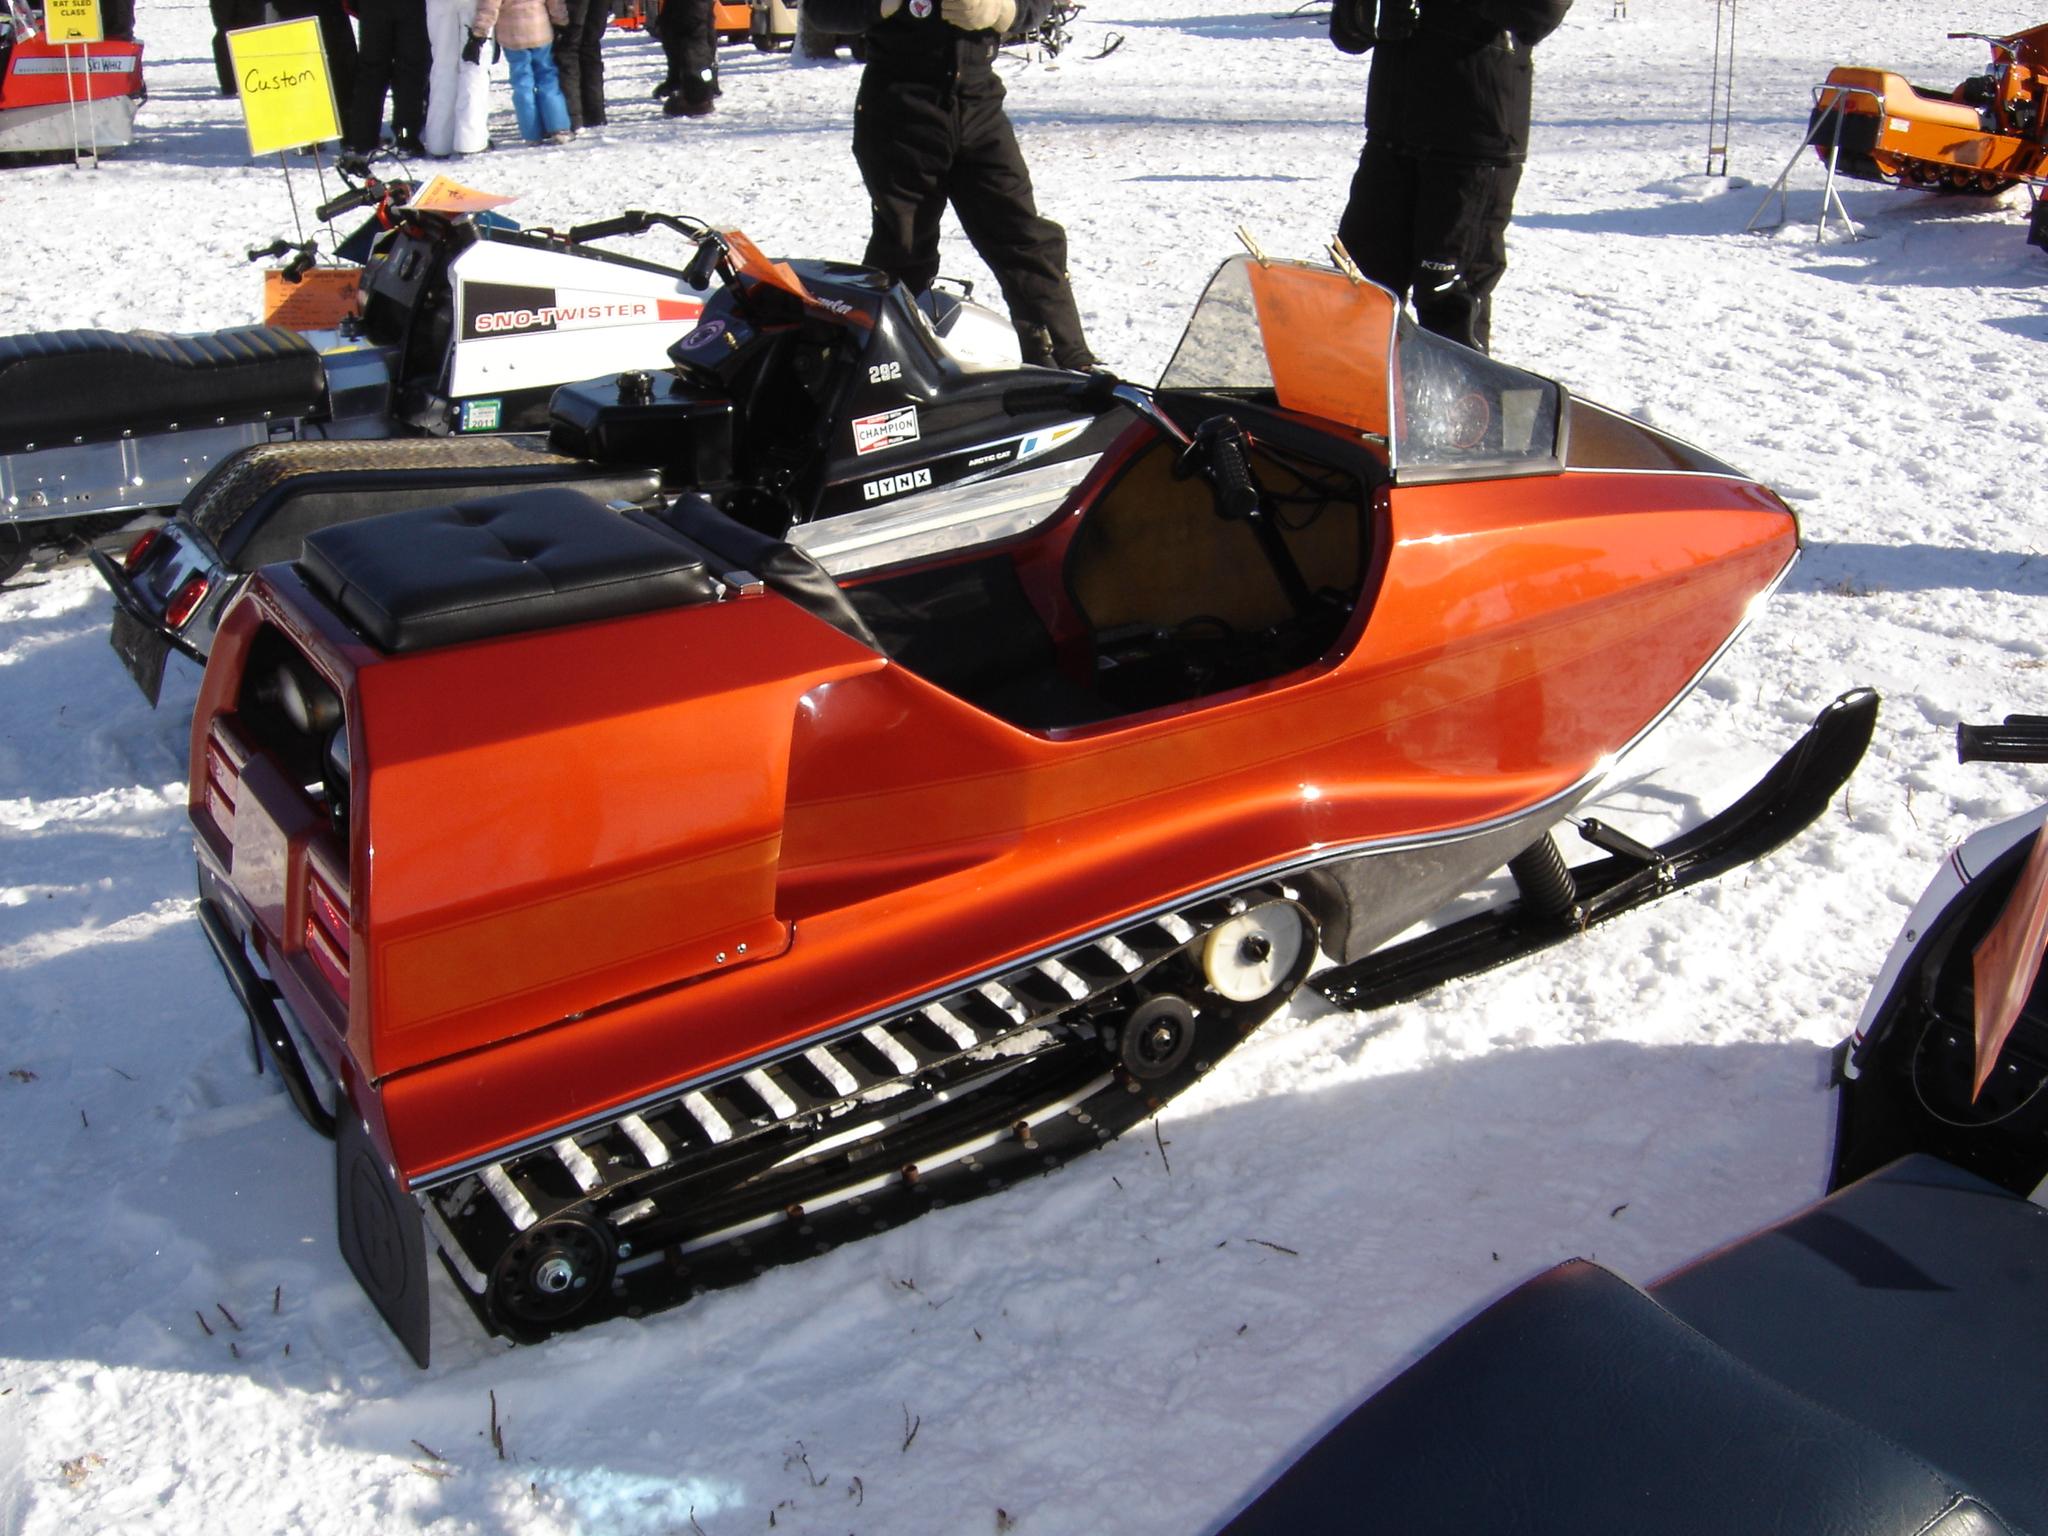 1973-raider-with-custom-paint-on-display-at-2012-lake-wachonia